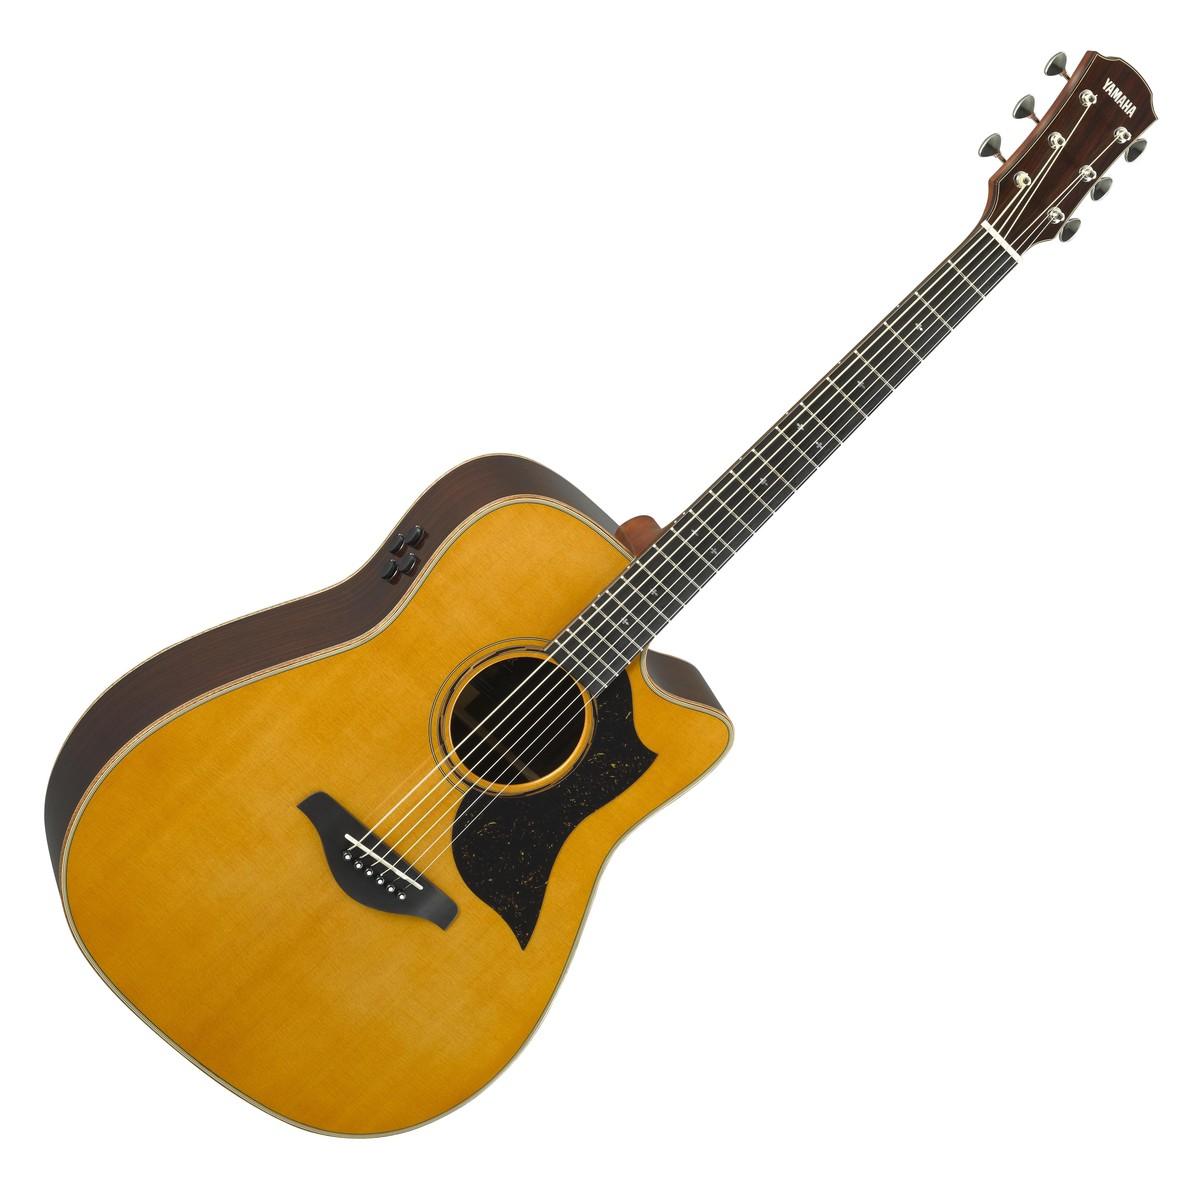 yamaha a5r rosewood electro acoustic guitar vintage. Black Bedroom Furniture Sets. Home Design Ideas